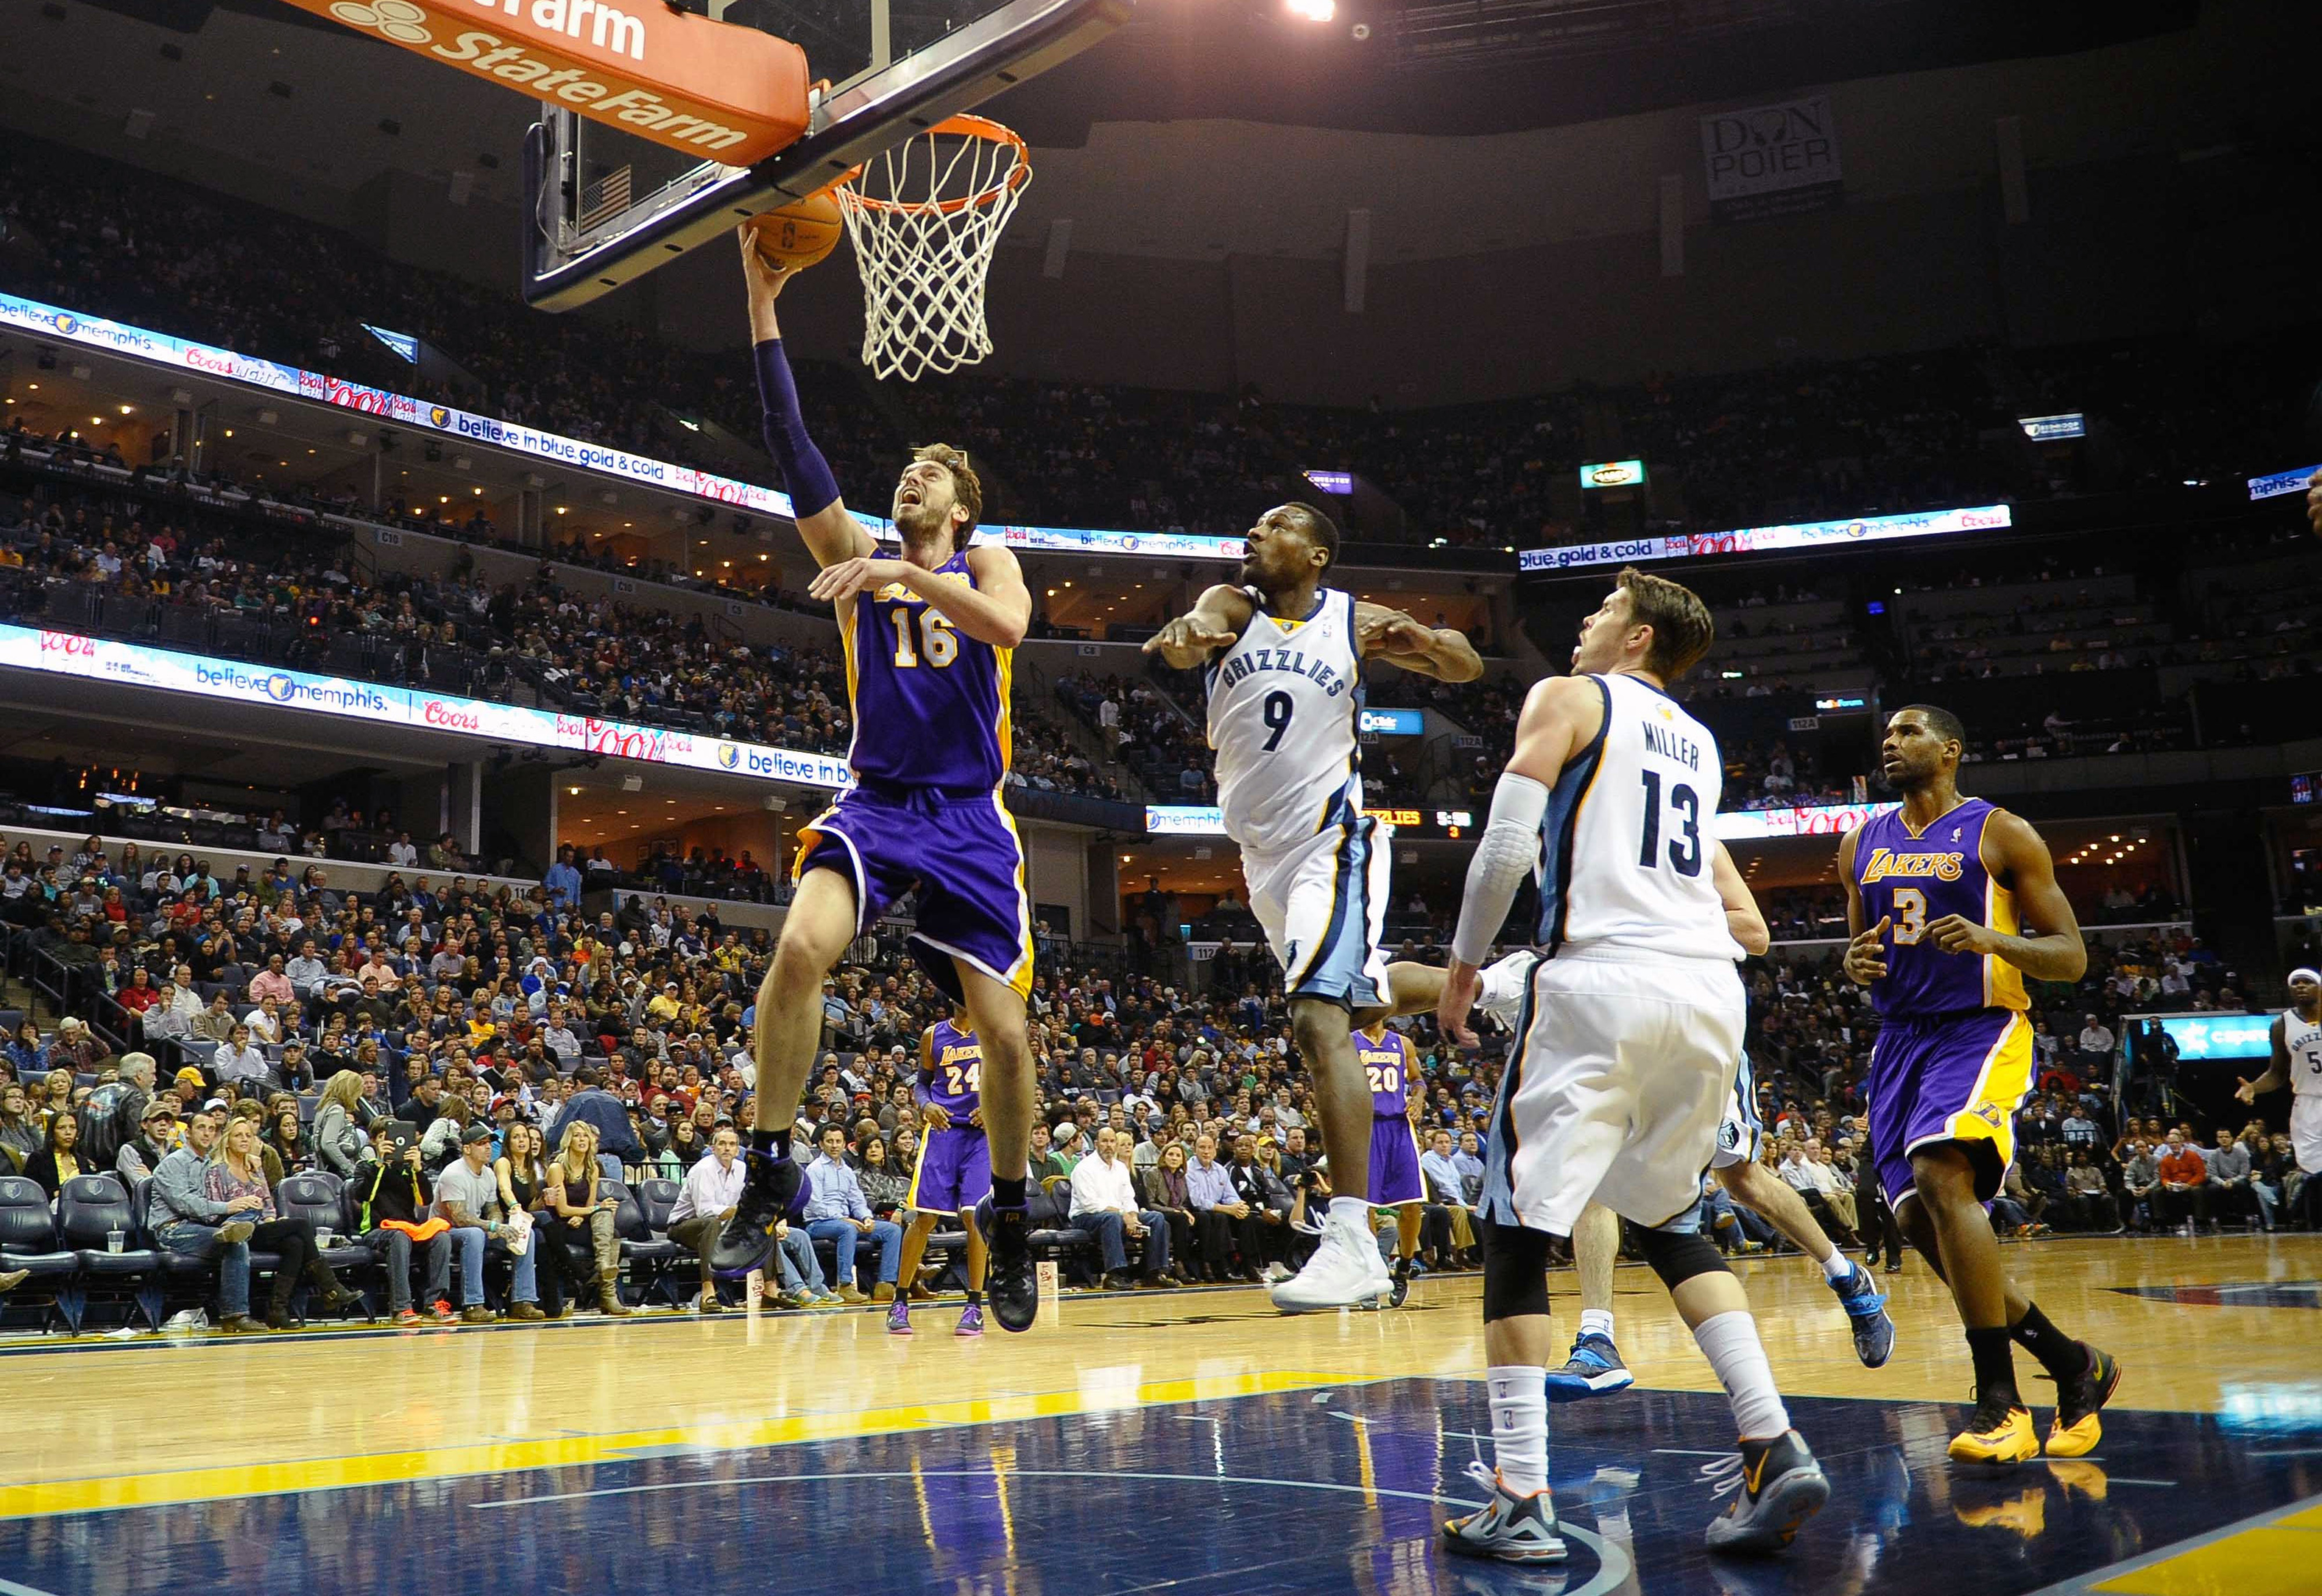 Pau Gasol trade rumors: Lakers PF not on market, per report